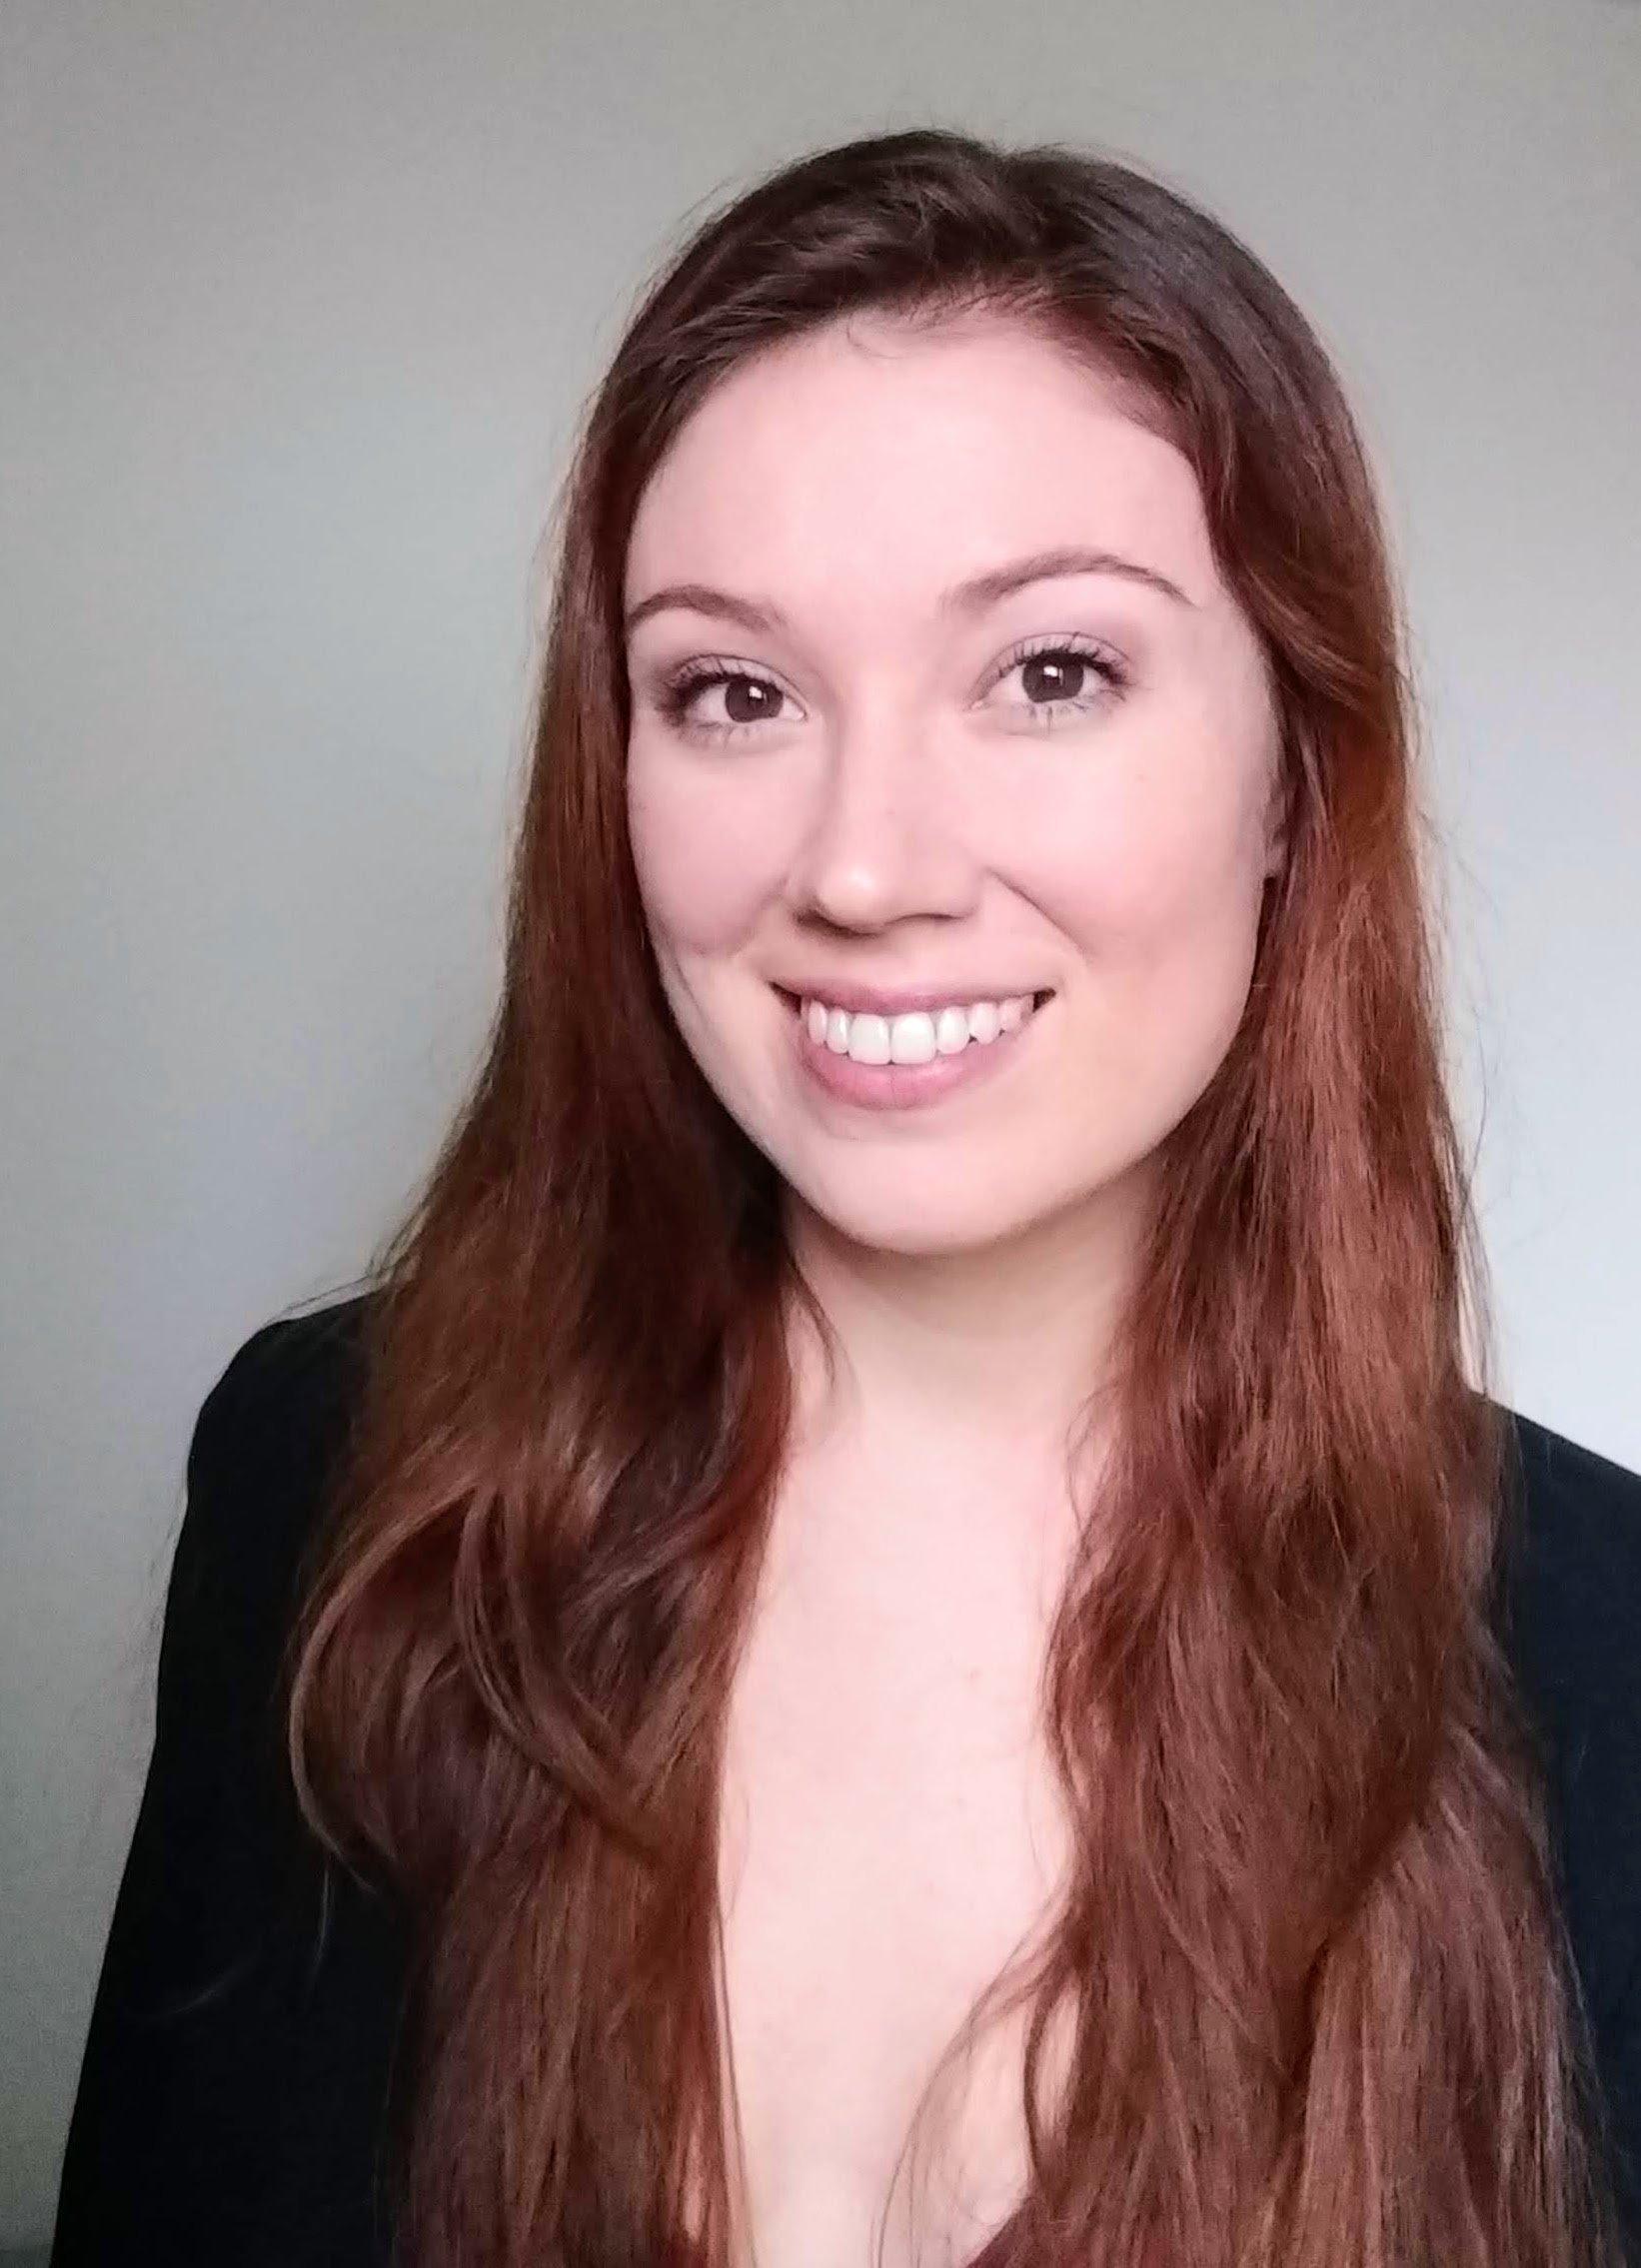 Kate Rouzer